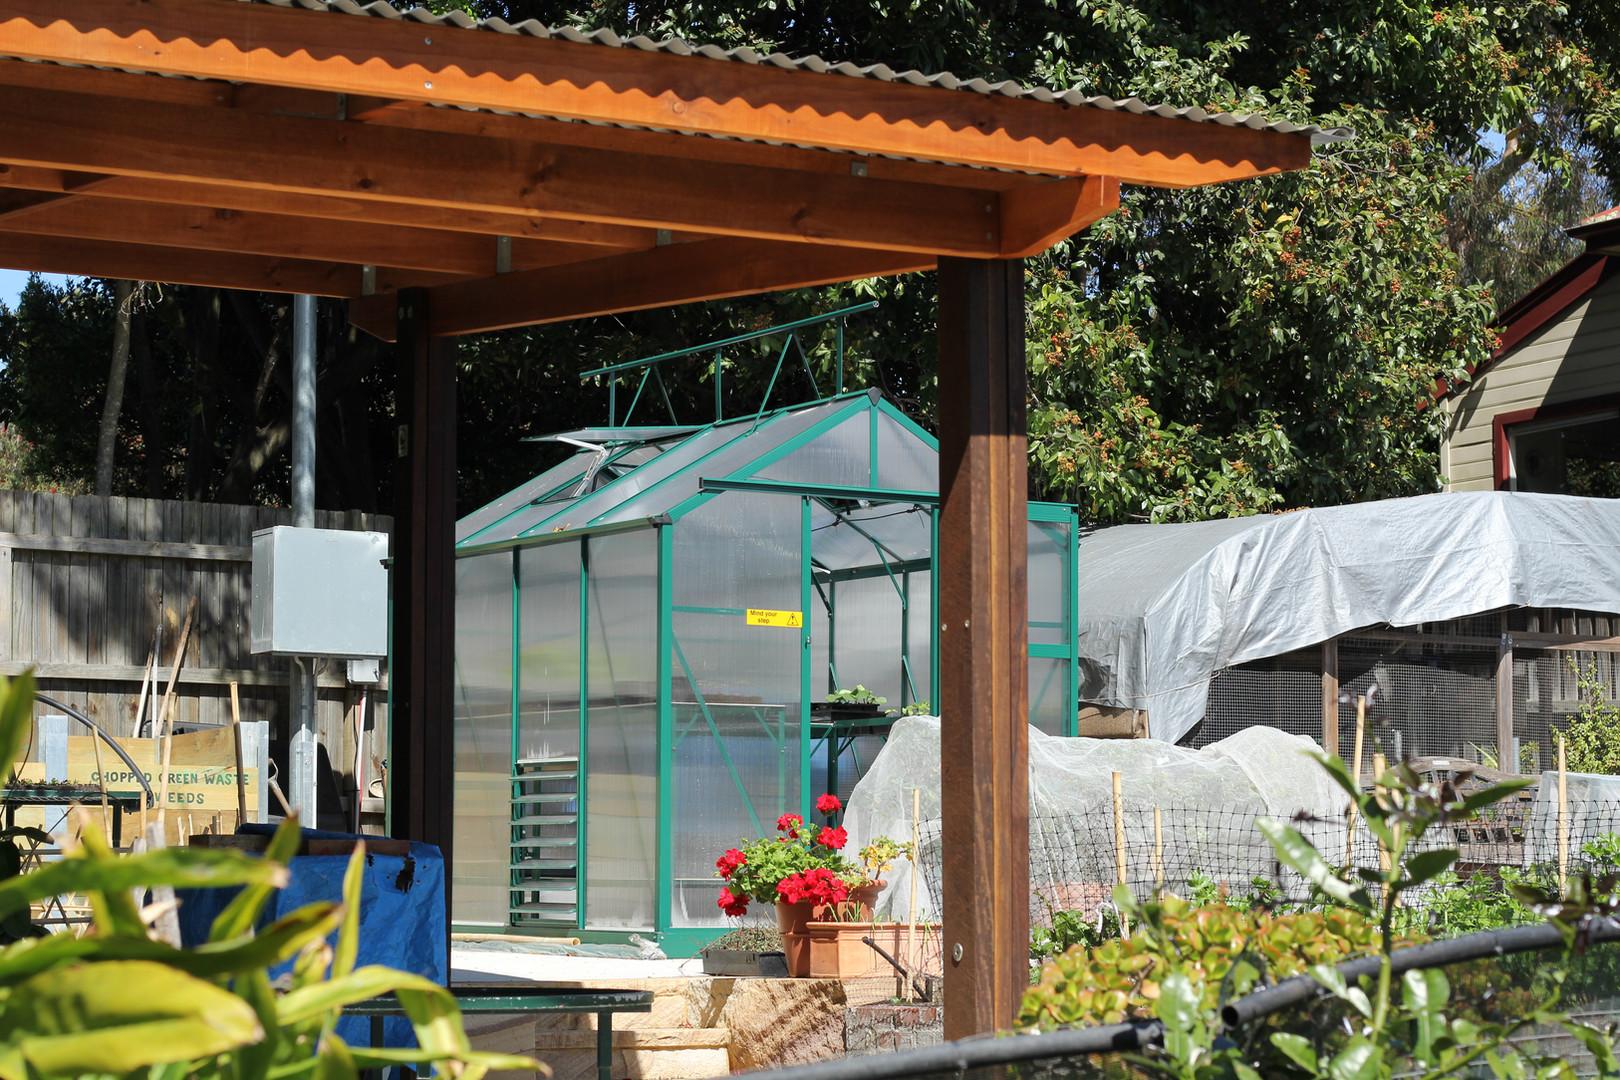 Seed Raising Greenhouse